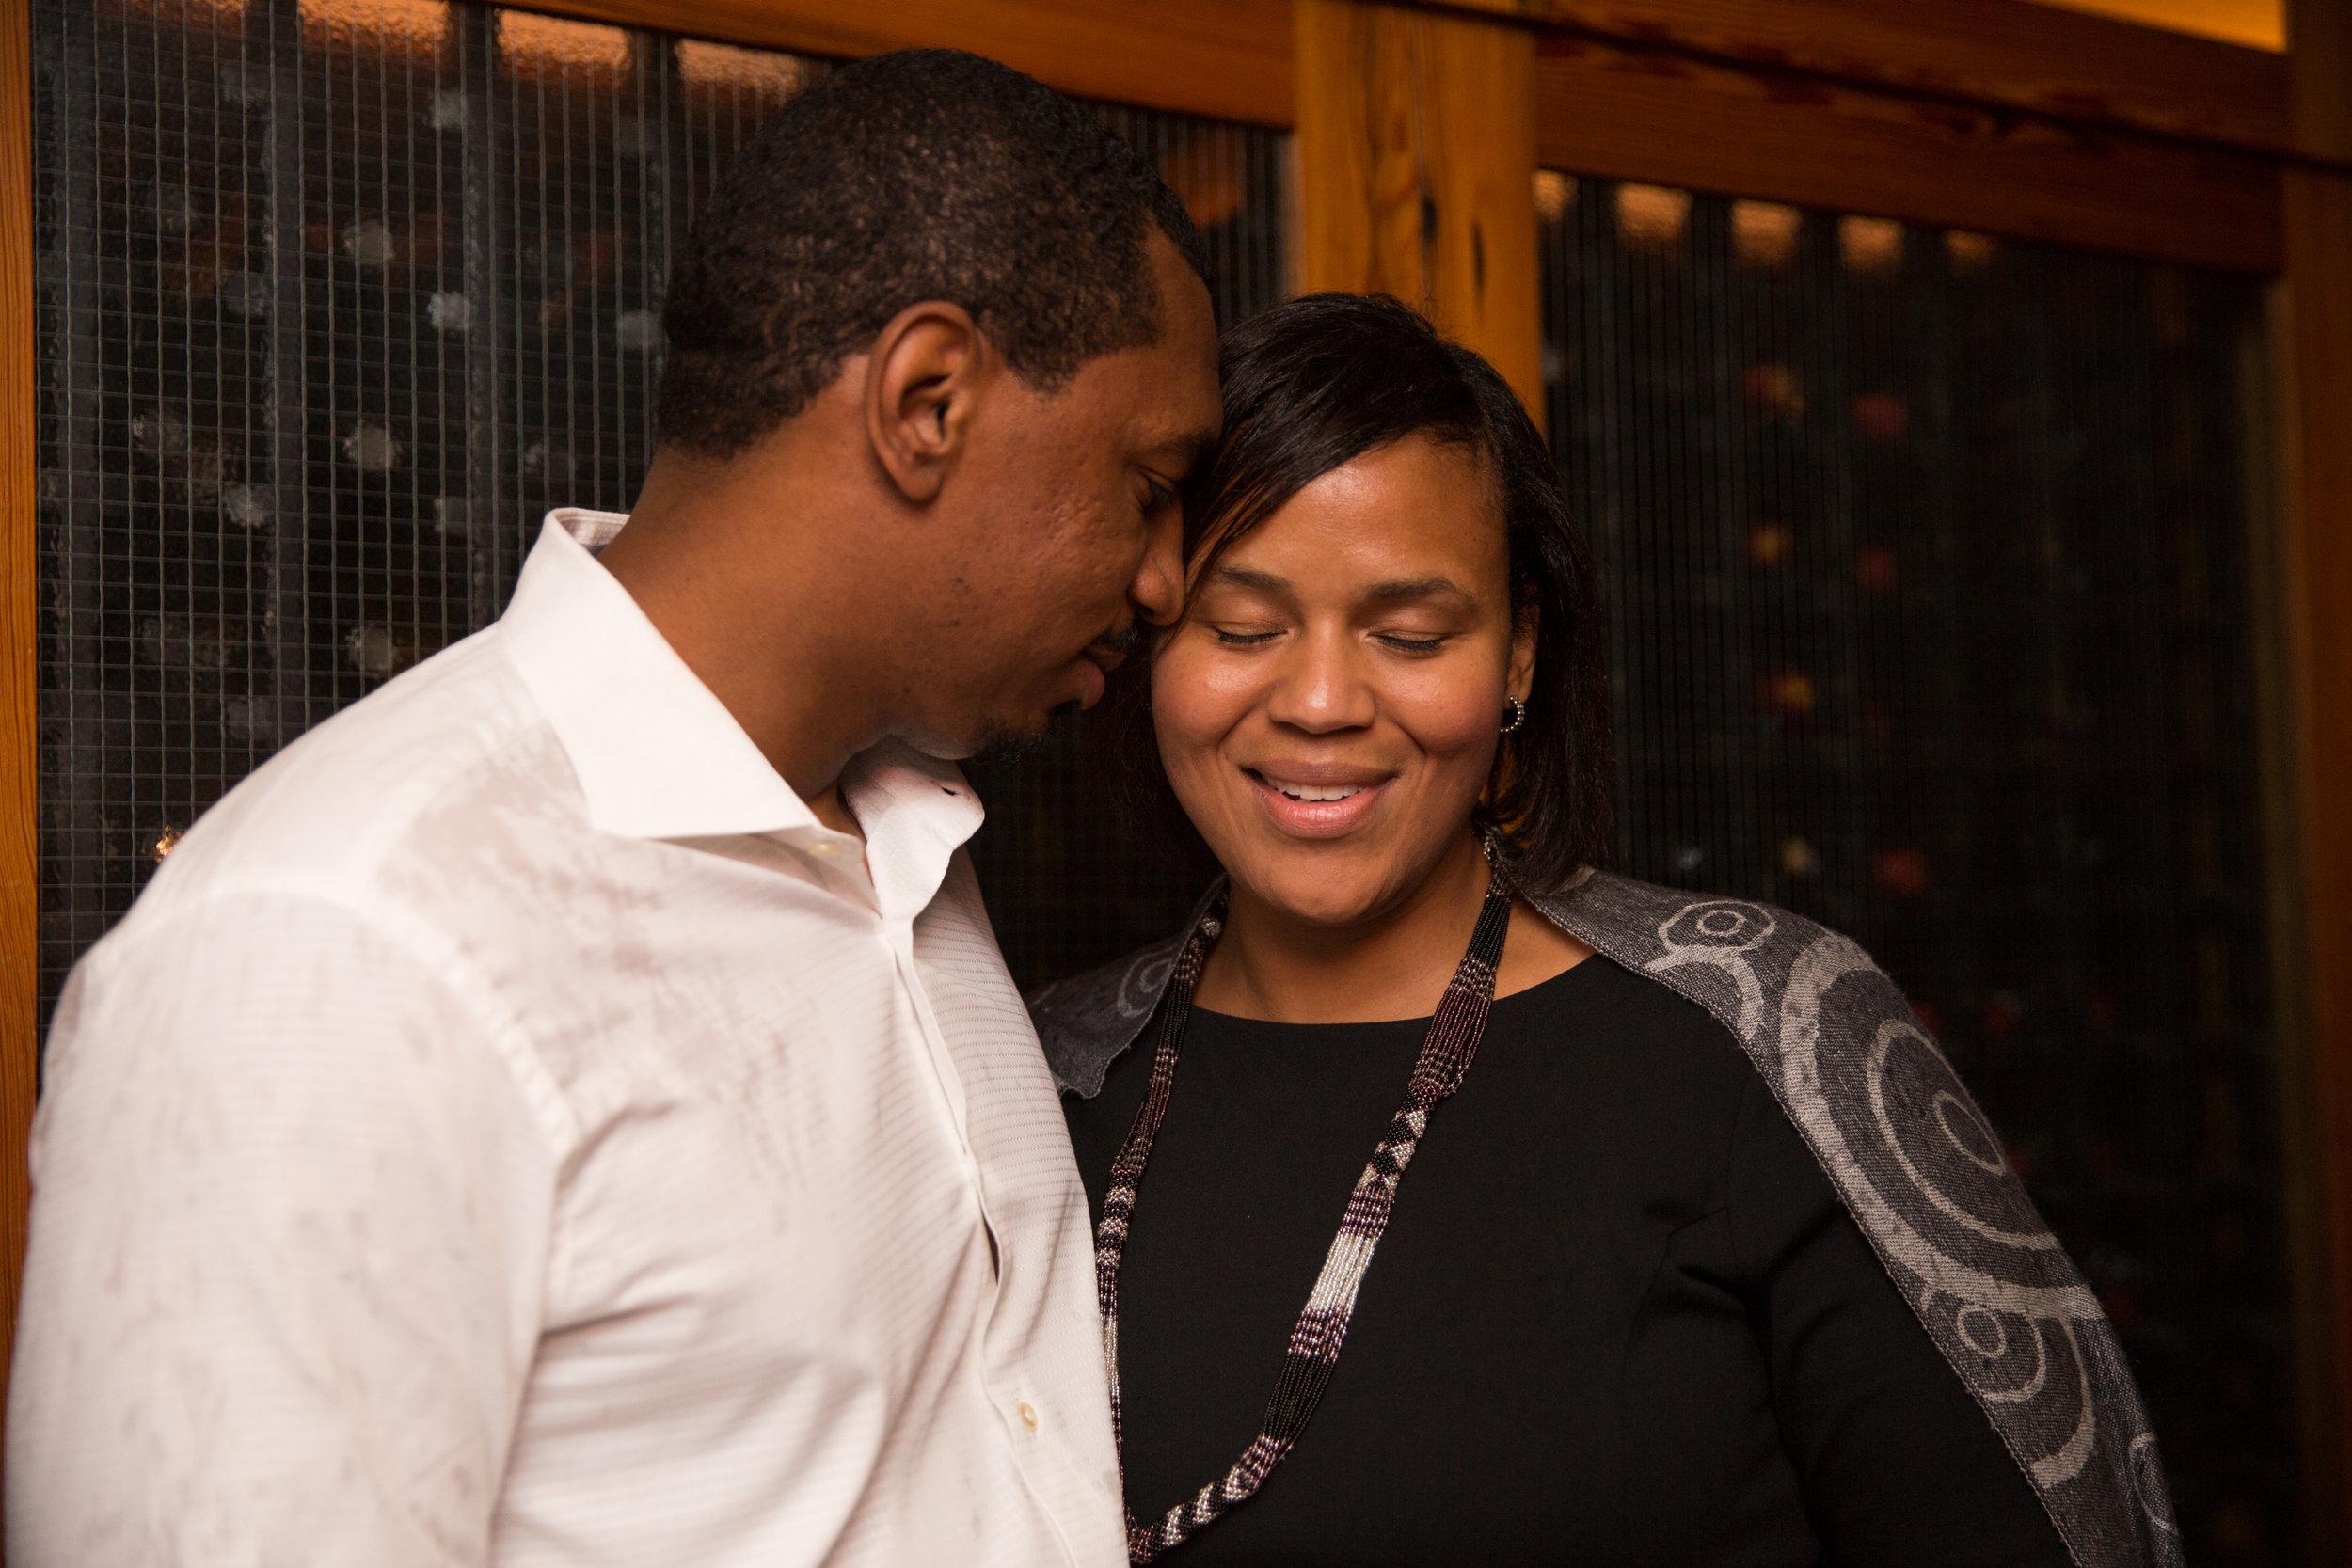 Baltimore Wedding Photographers also photograph proposals